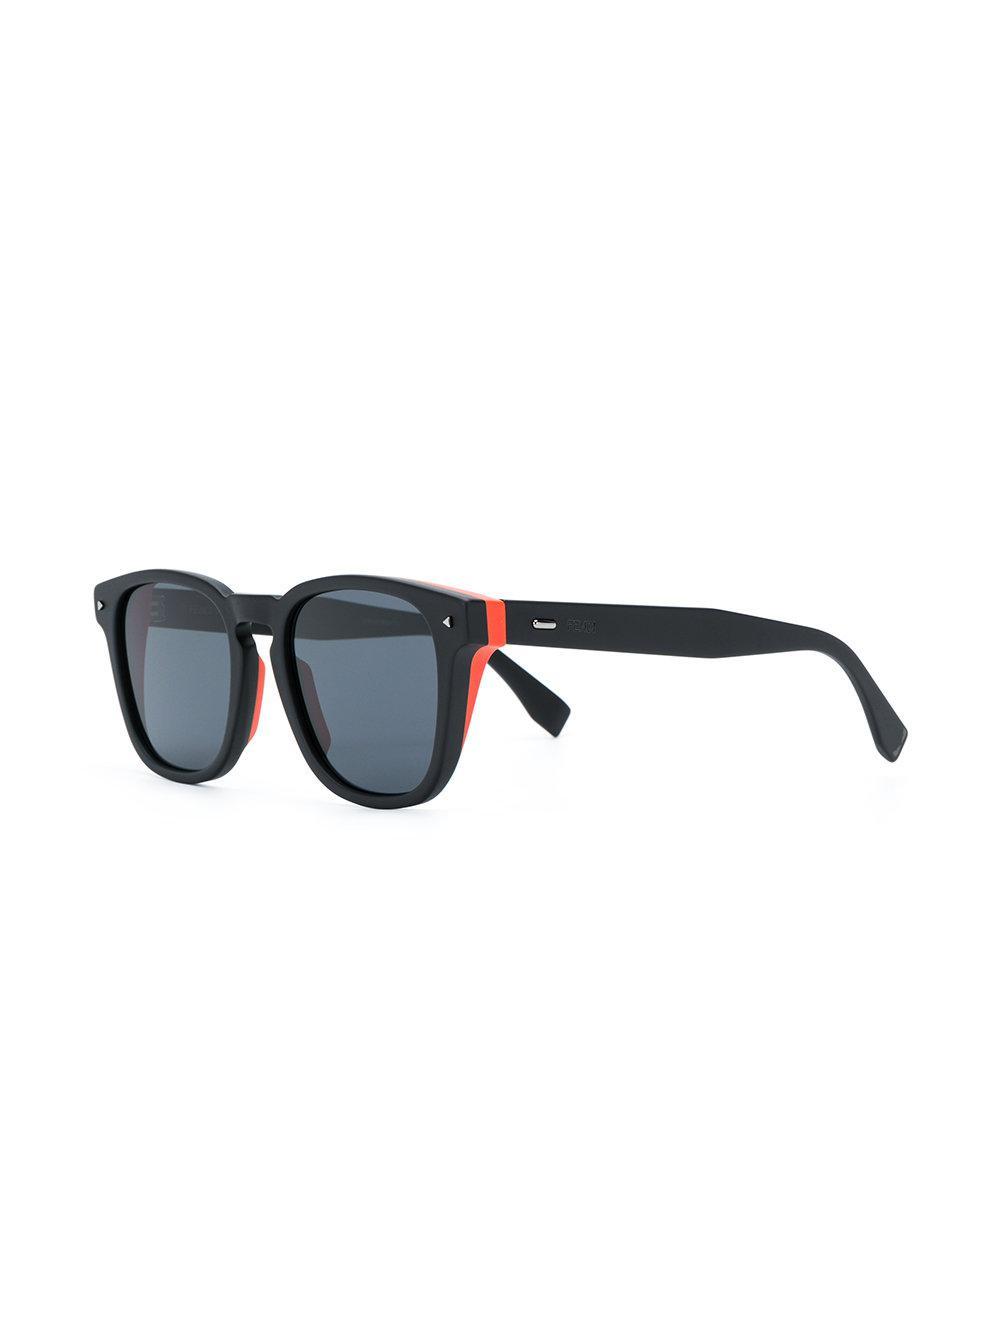 2c7c40b6224 Lyst - Fendi I See You Sunglasses in Black